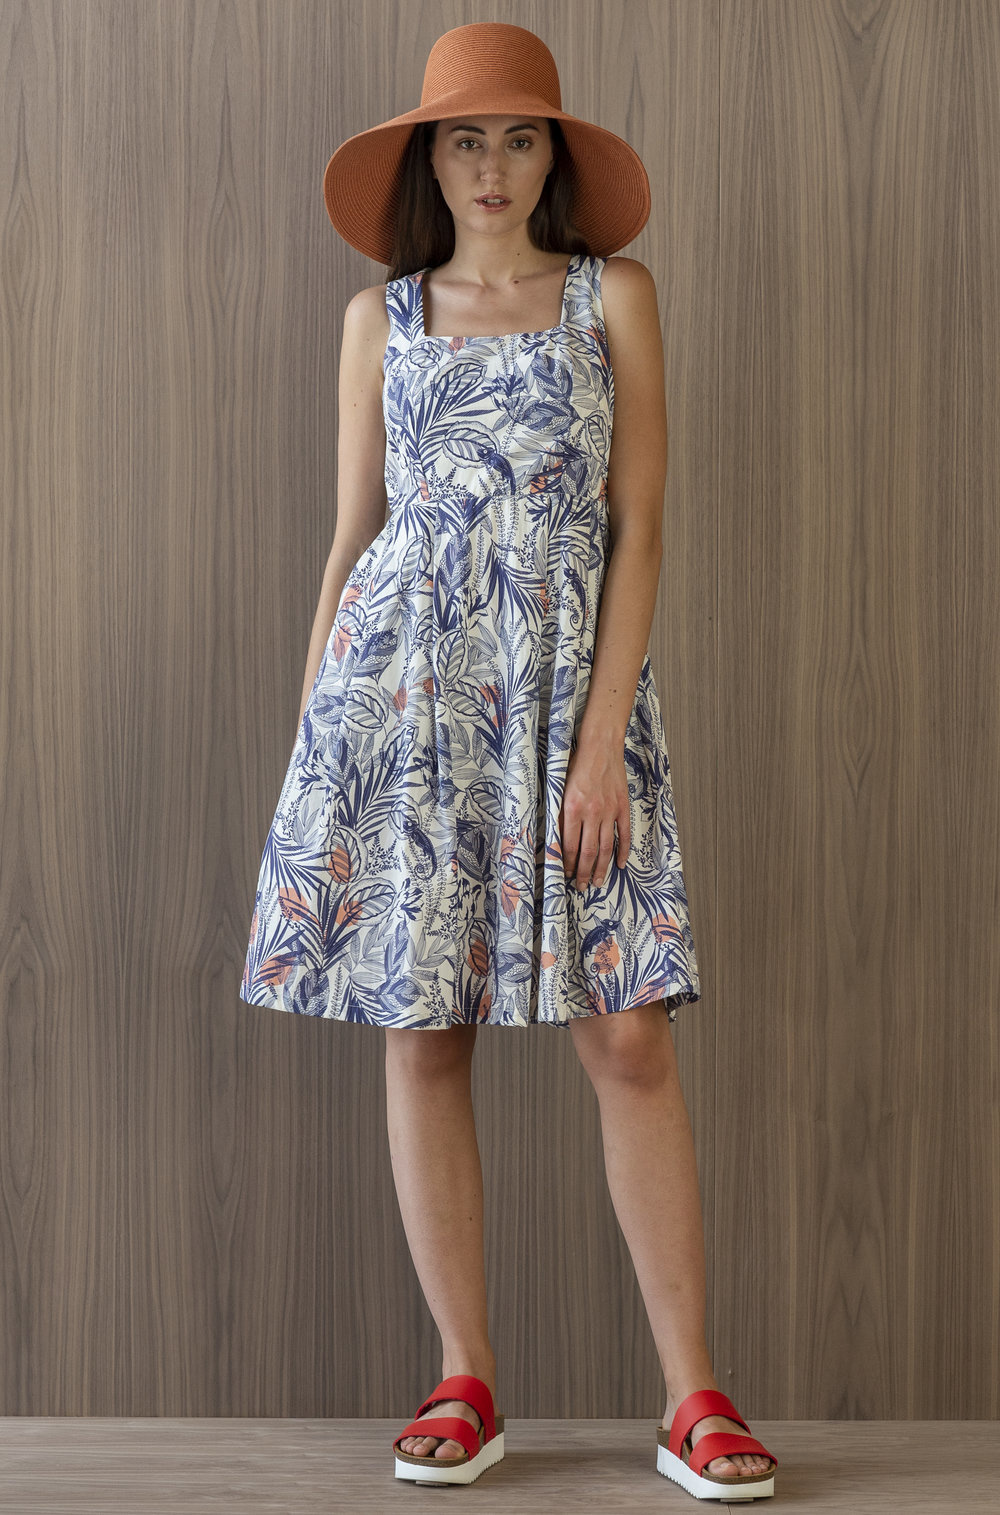 Bodybag Pacifica Dress